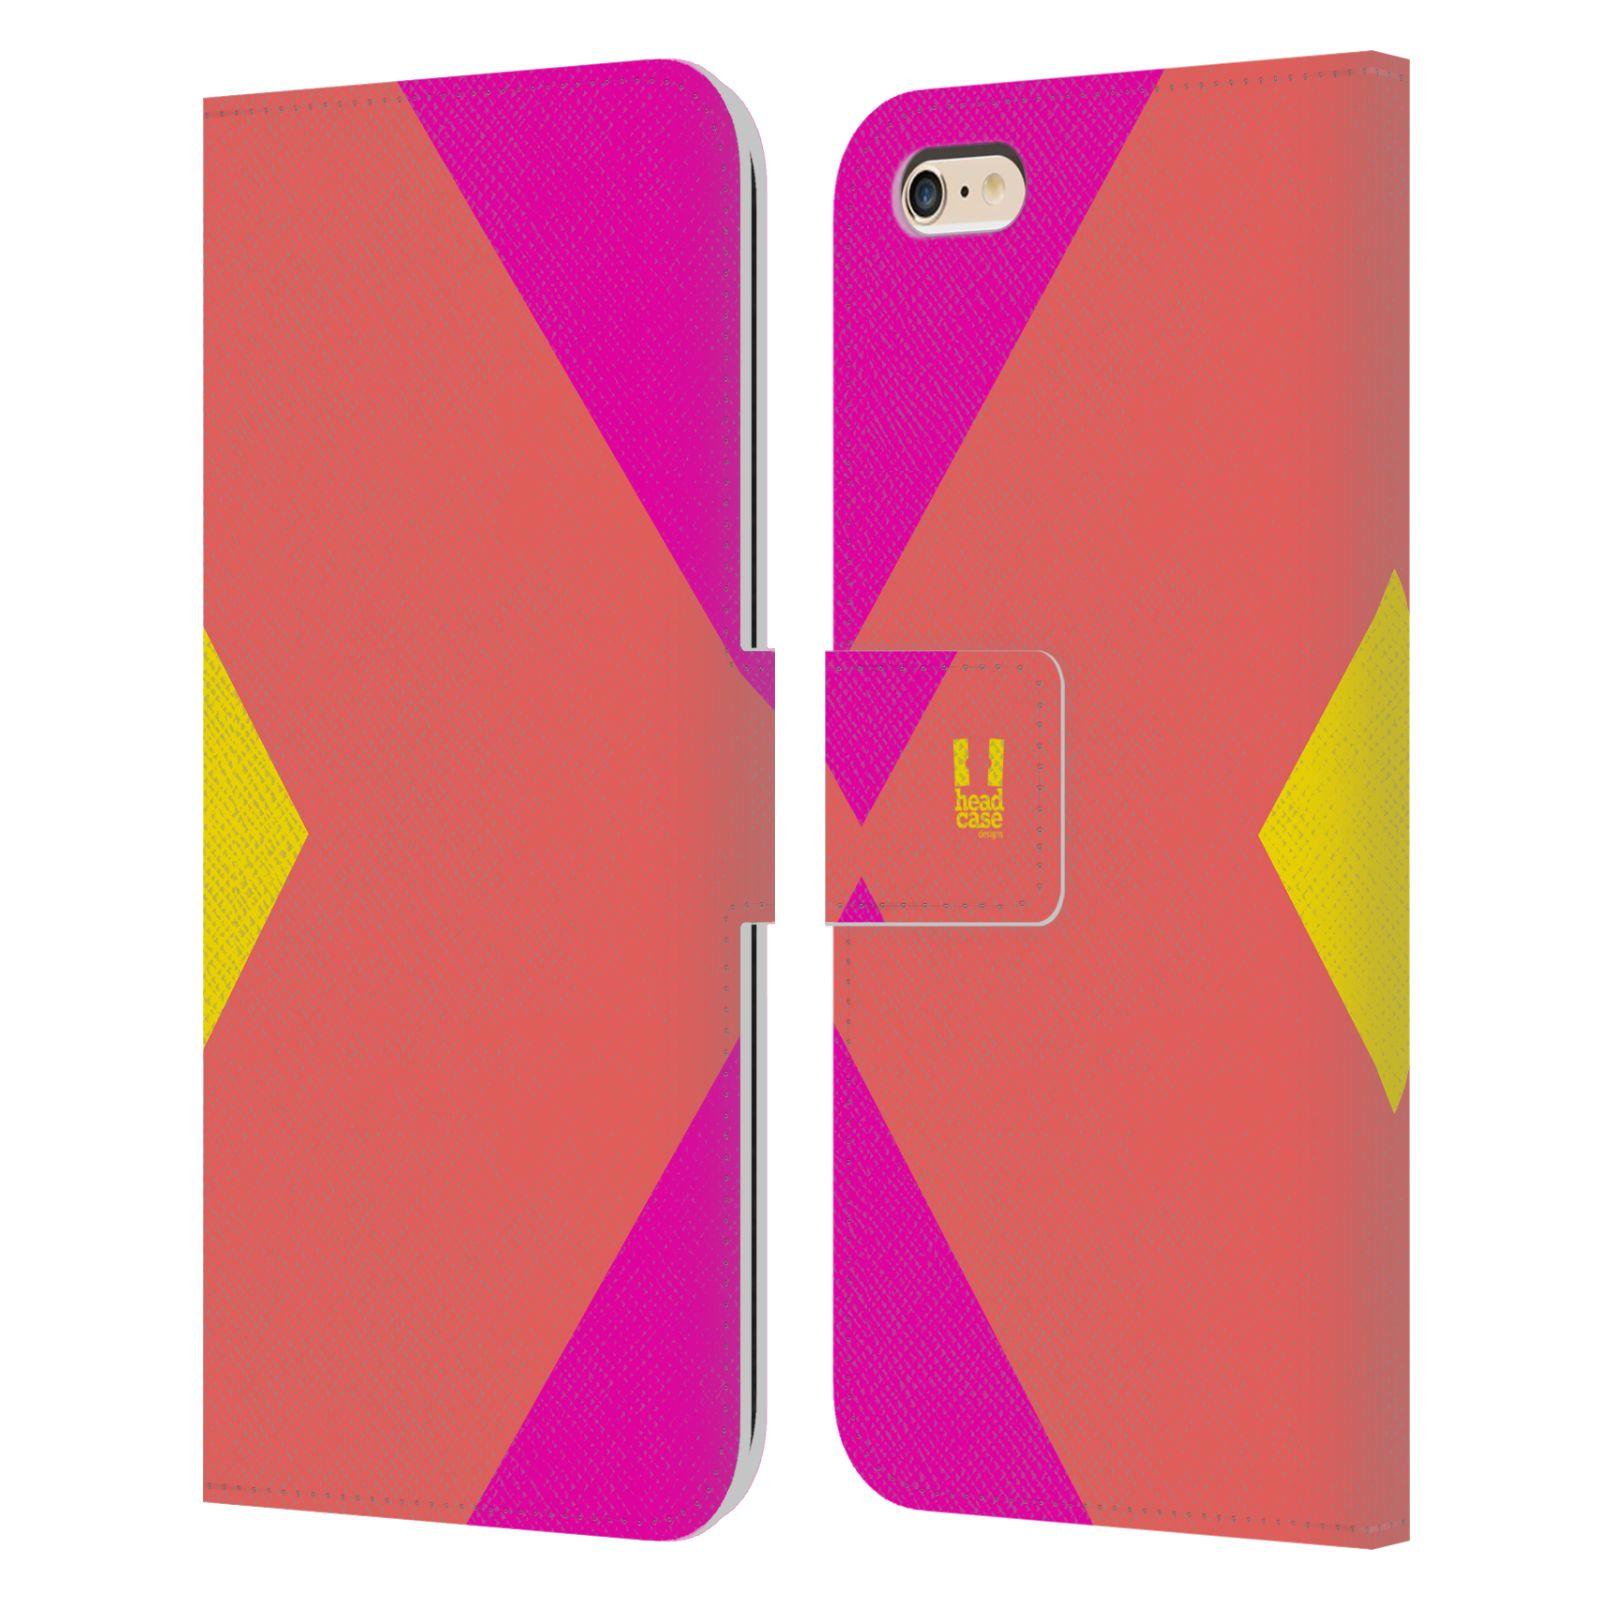 HEAD CASE Flipové pouzdro pro mobil Apple Iphone 6 PLUS/6S PLUS barevné tvary růžová korál